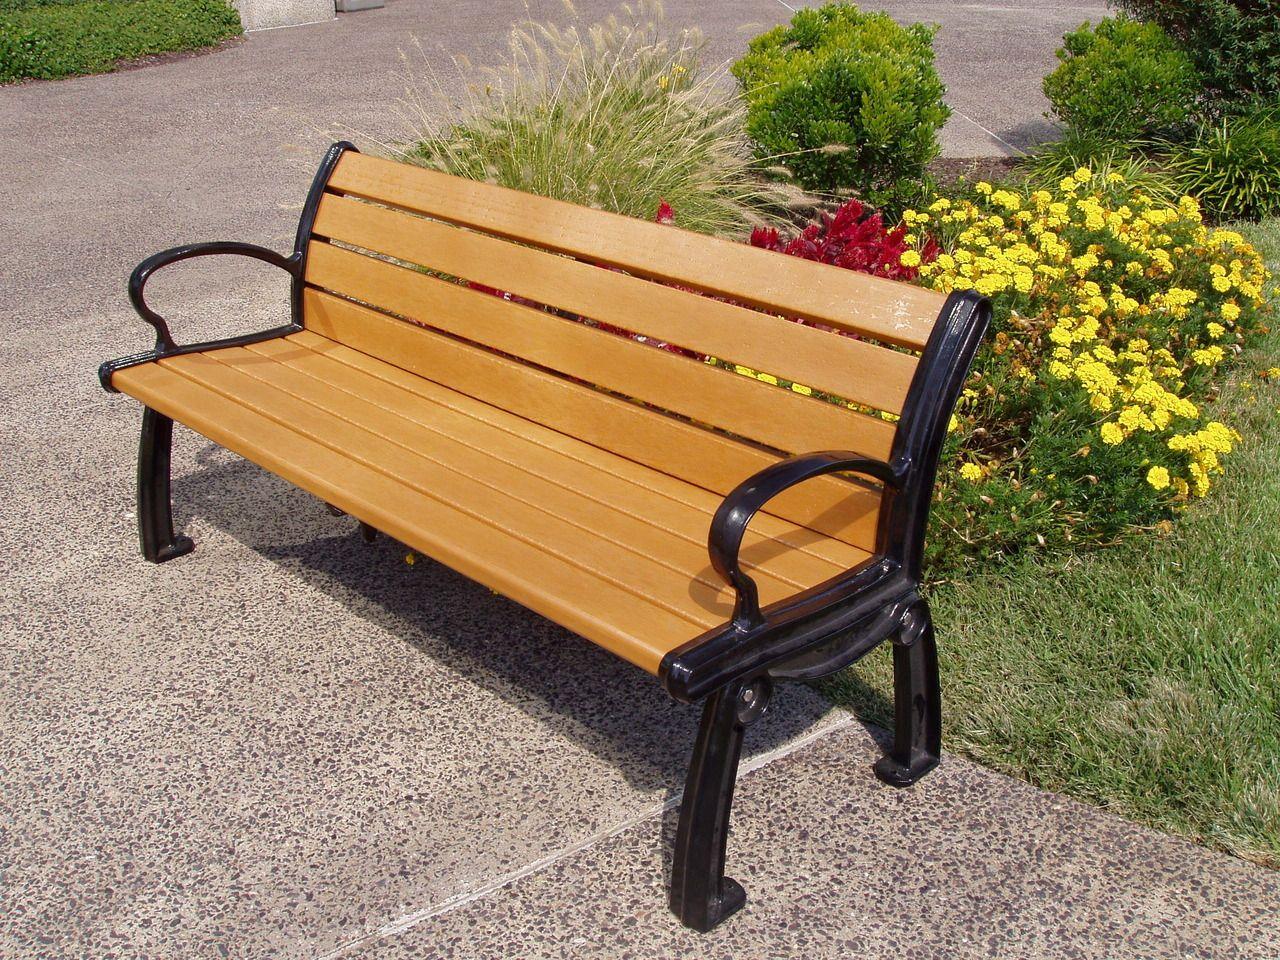 heritage park bench